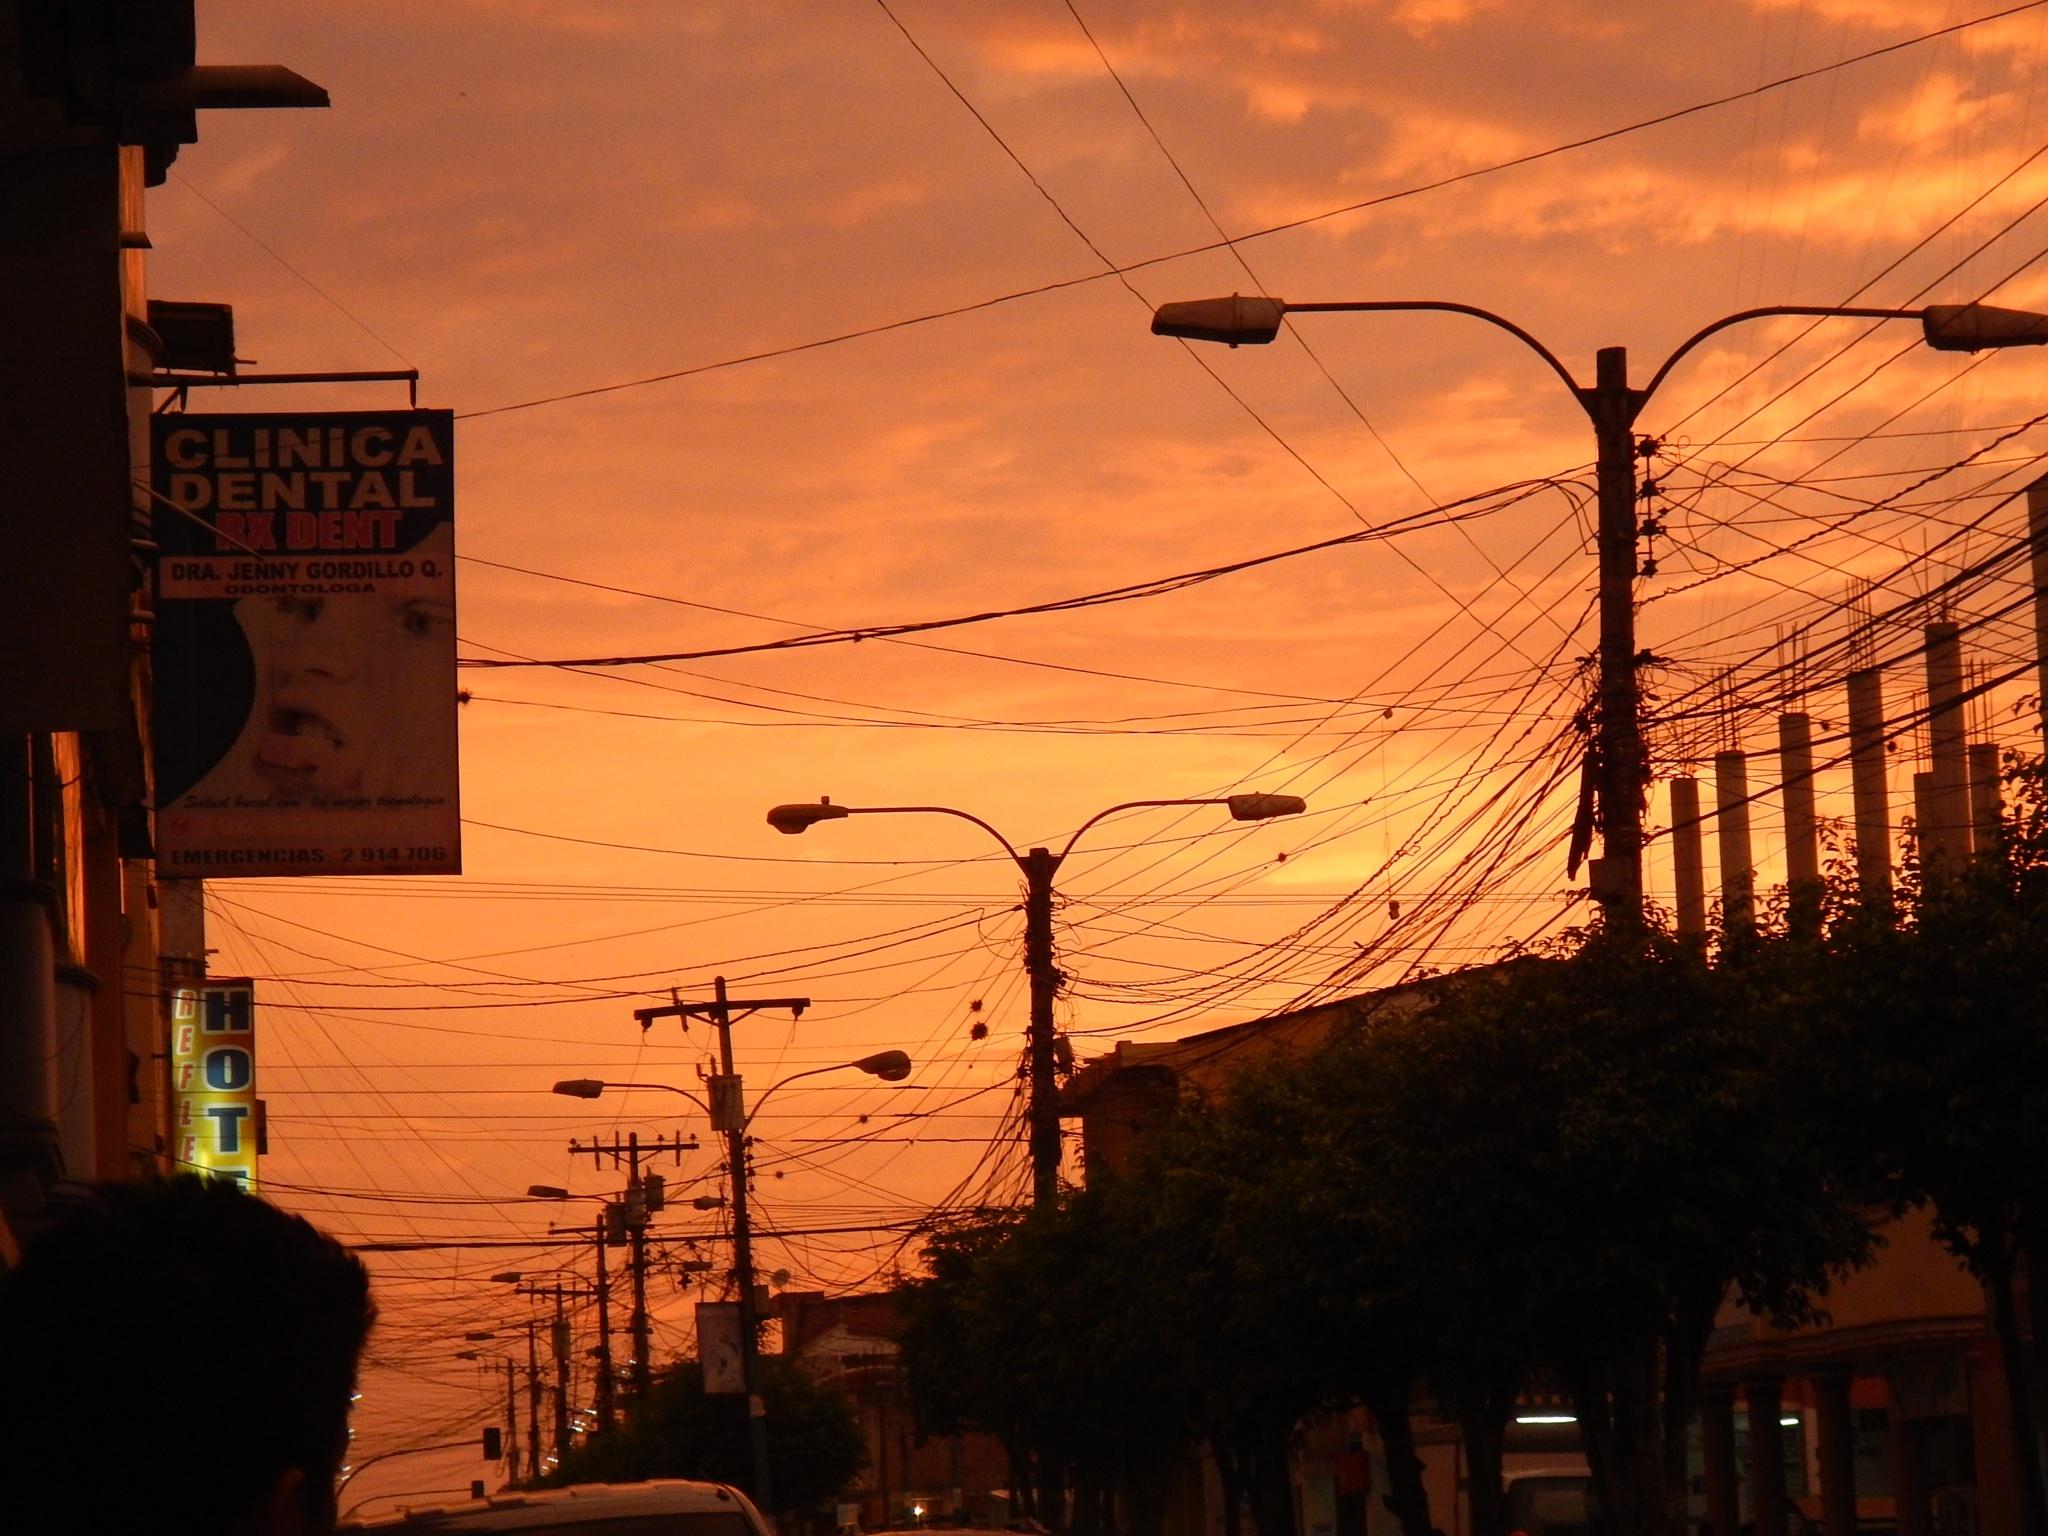 Ecuadorian Sunset by rhondaobason